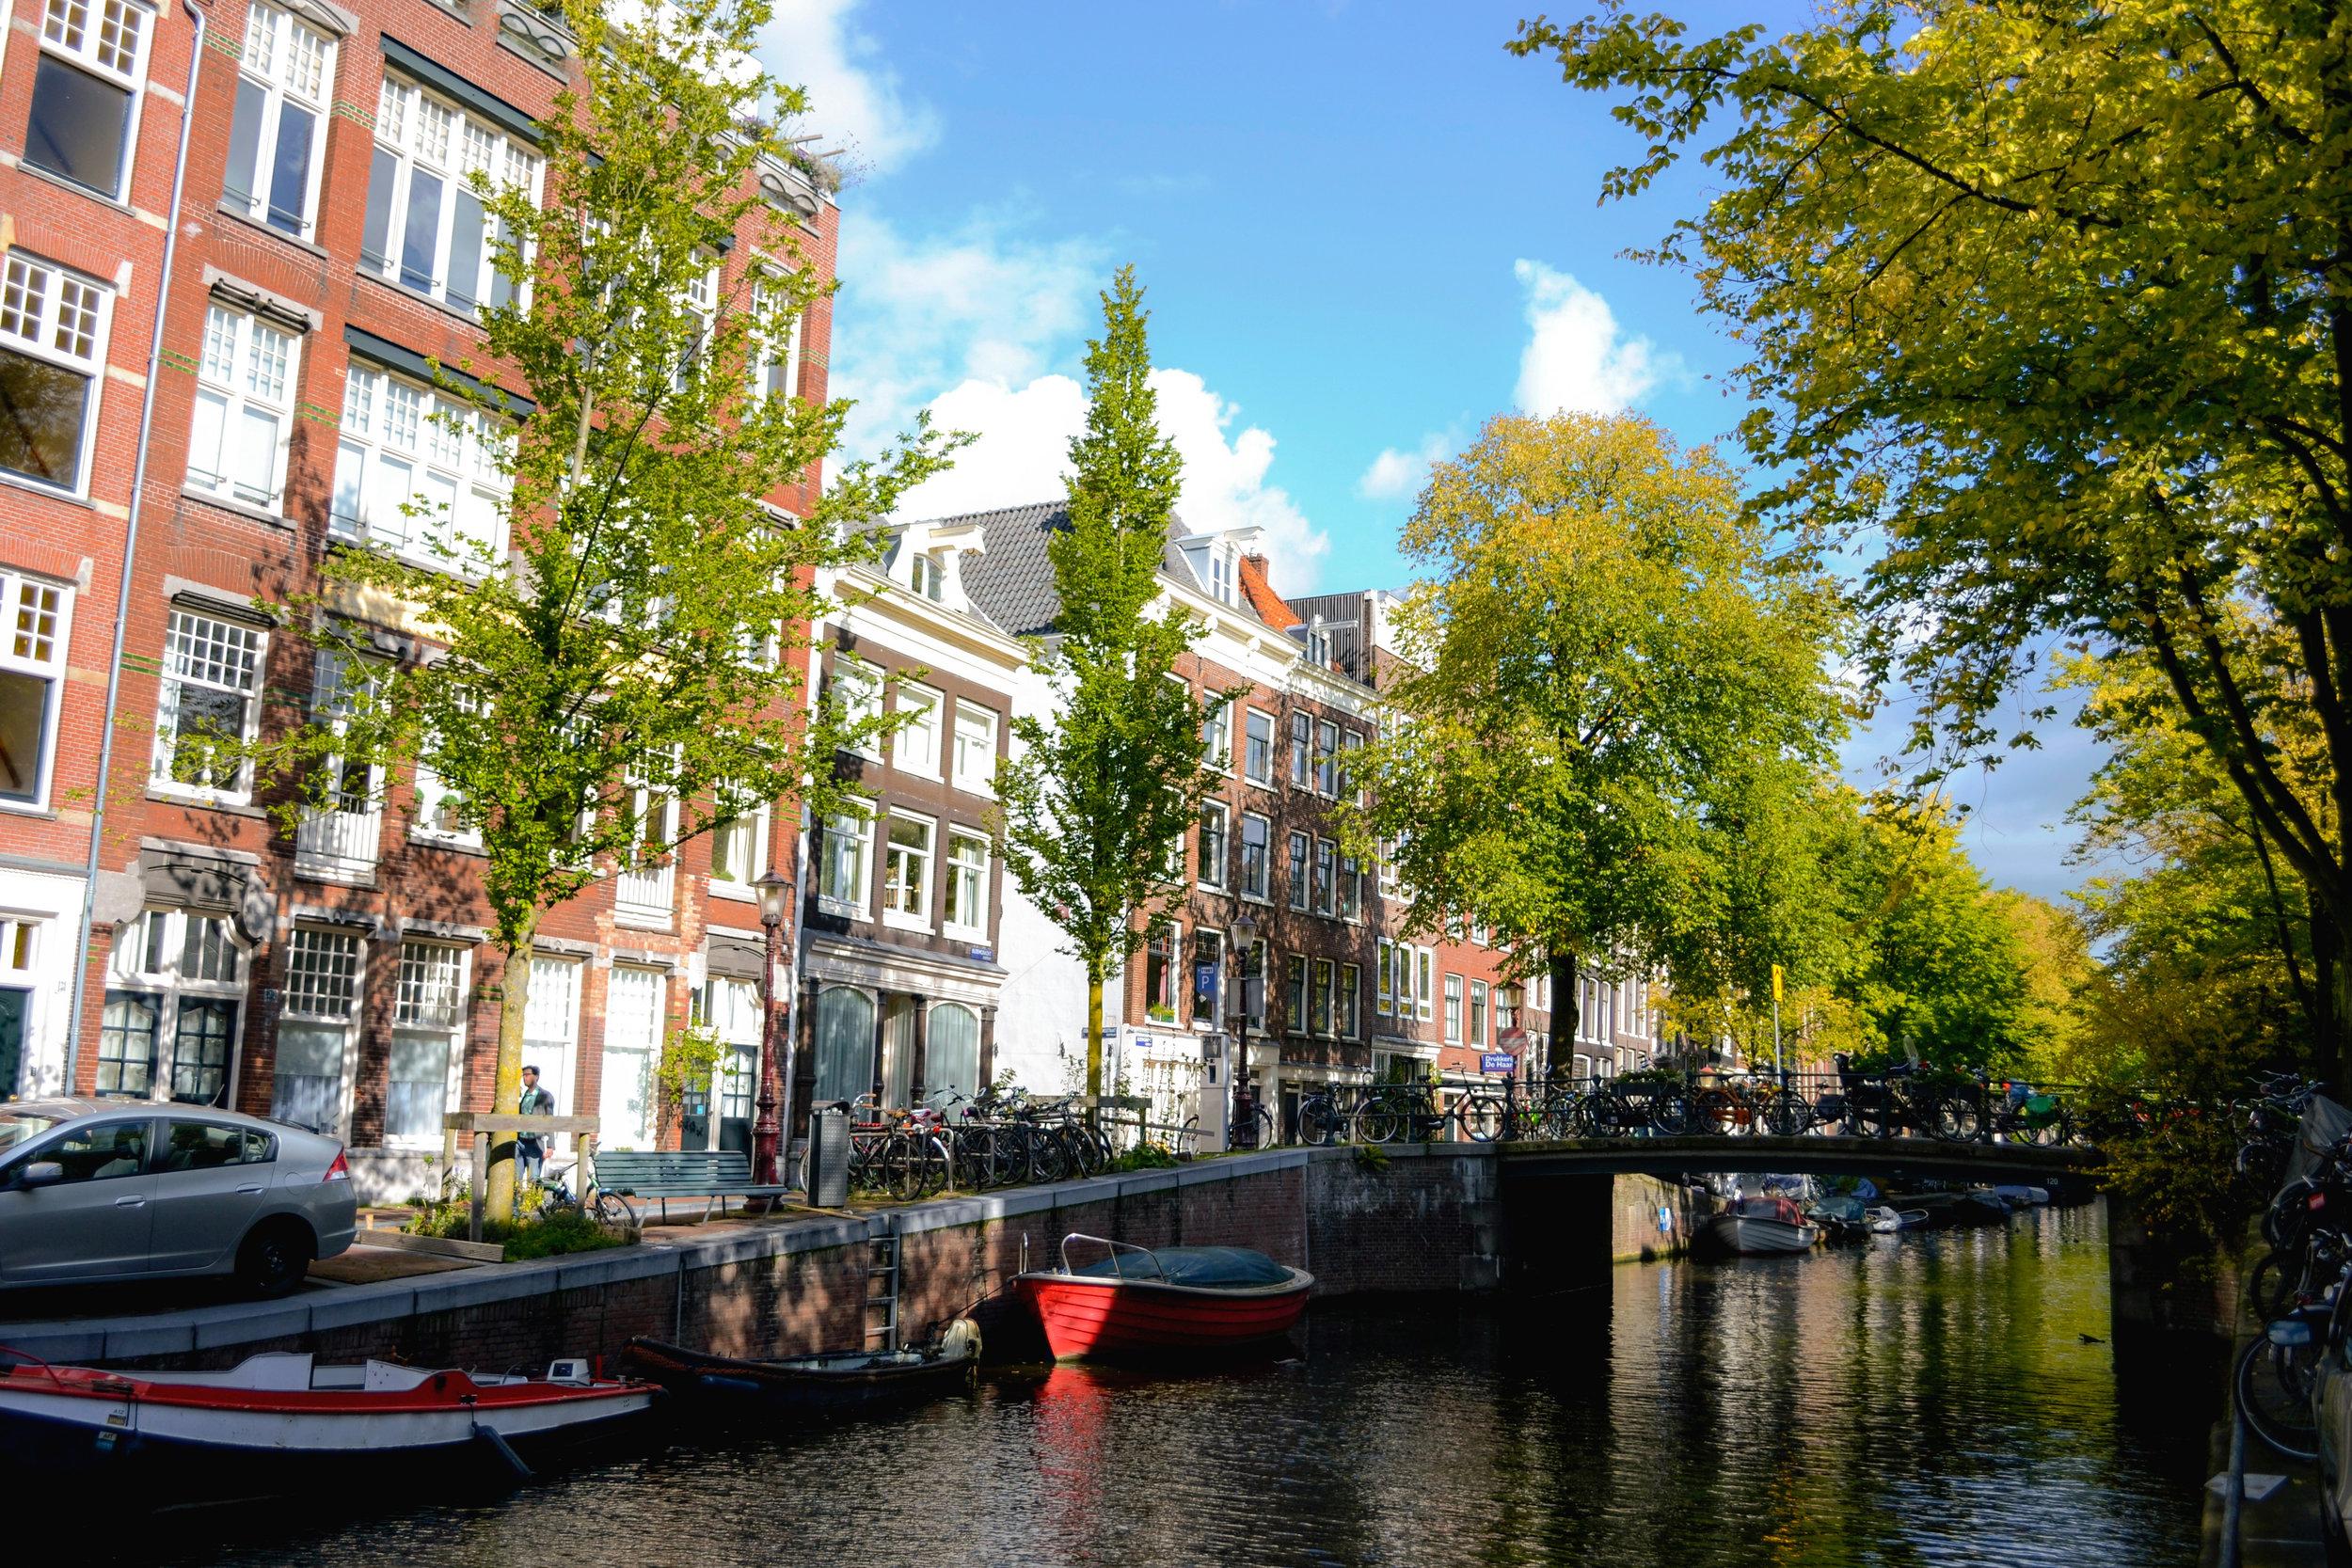 amsterdam-canal-03.jpg